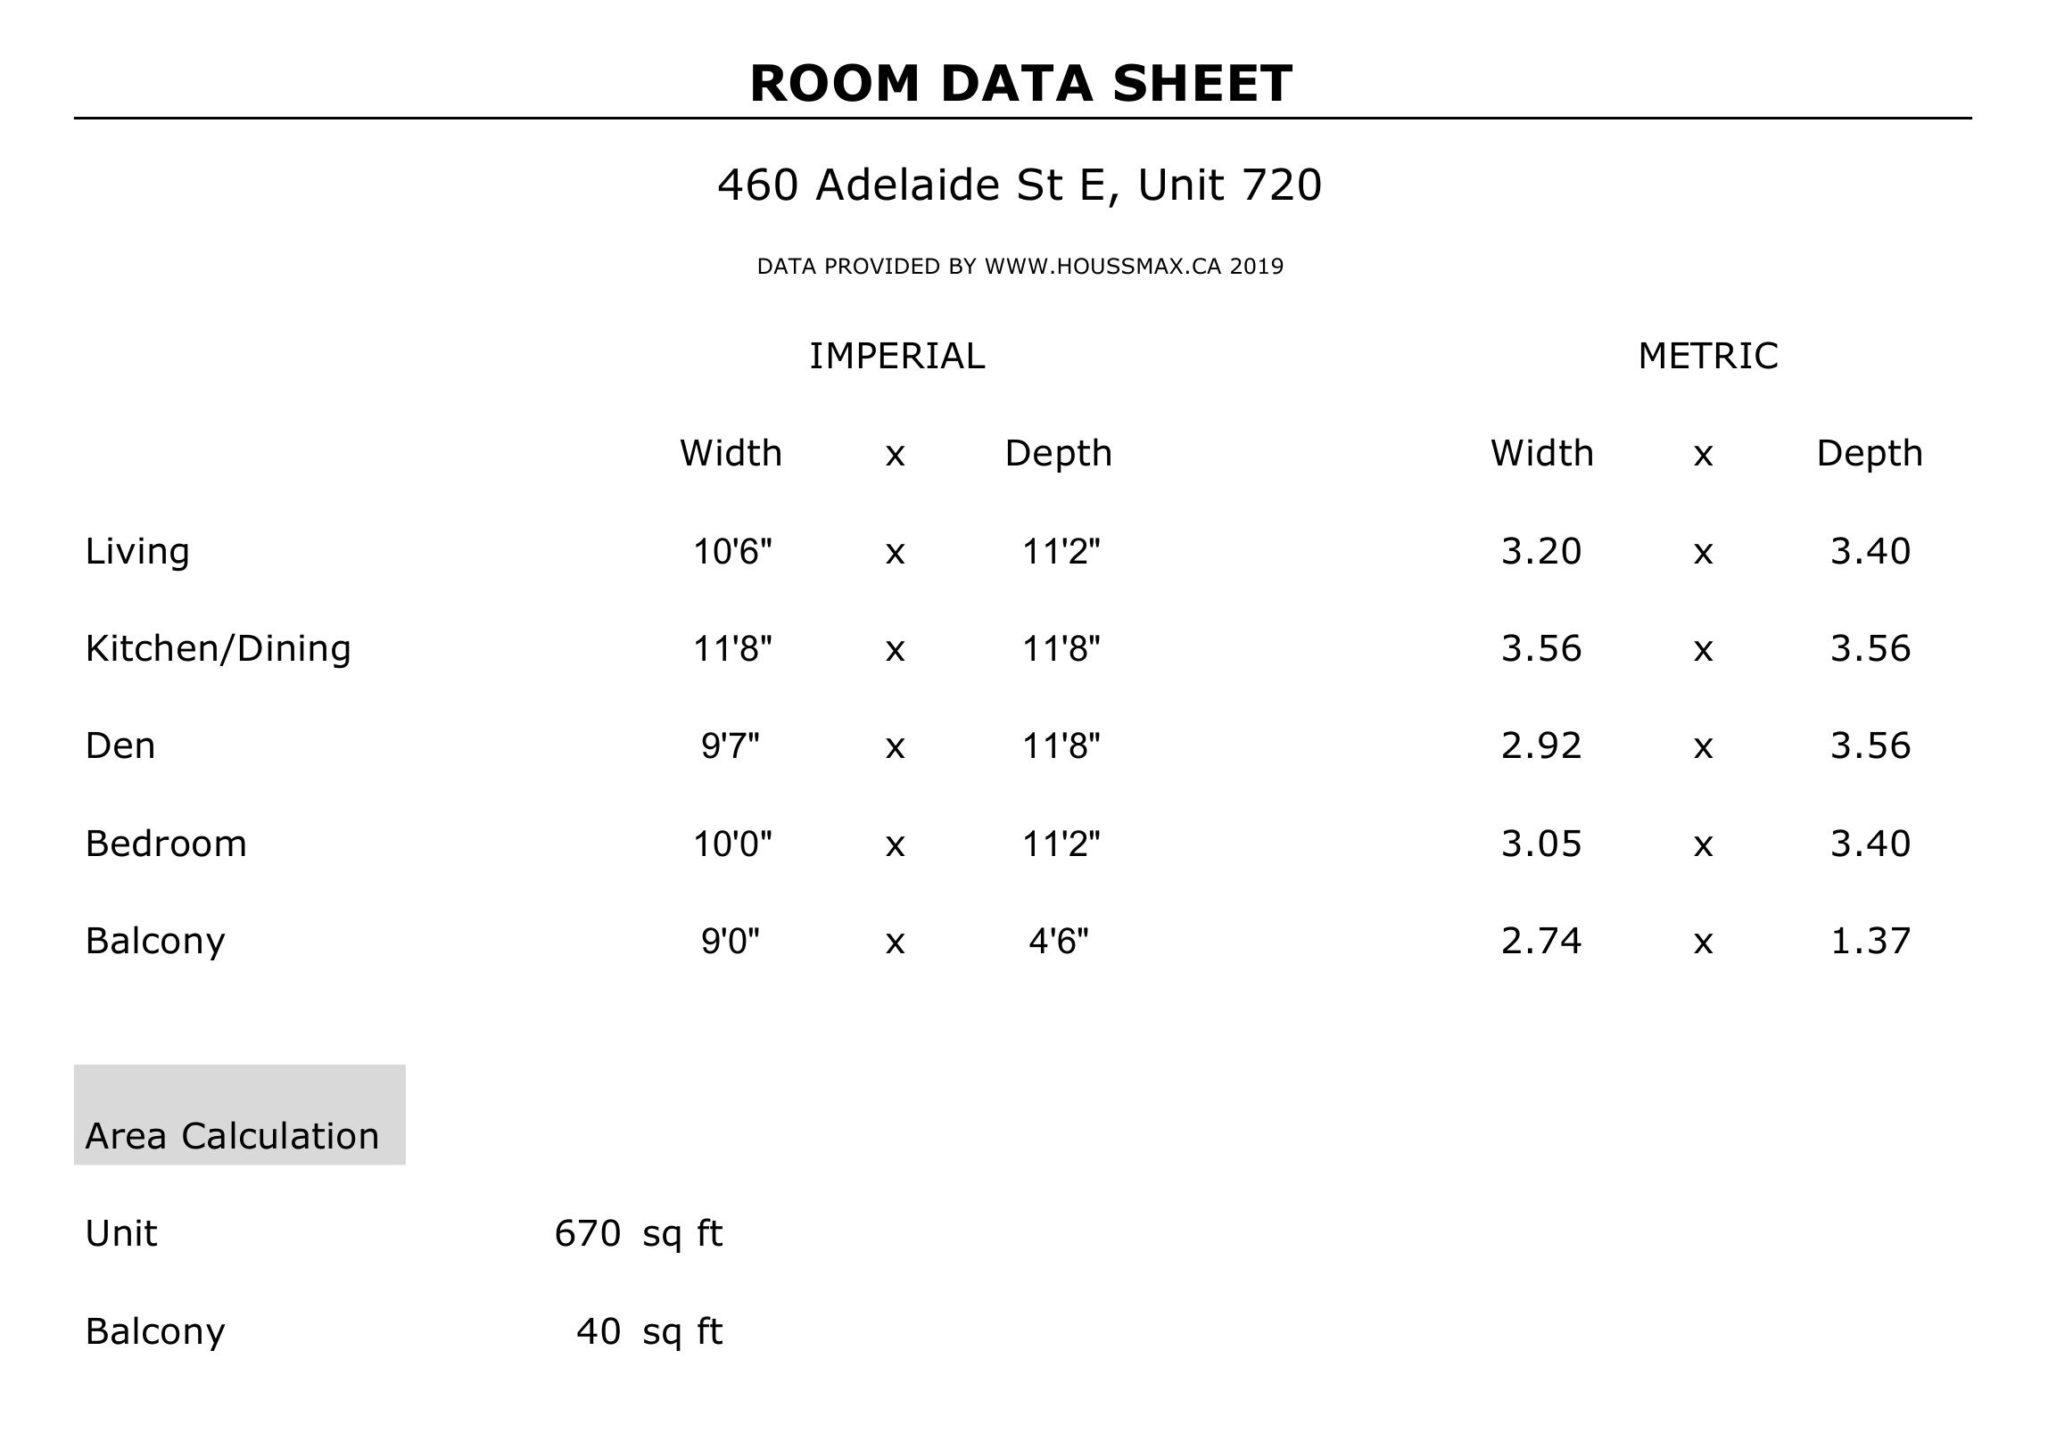 Unit 620 measurements and room sizes